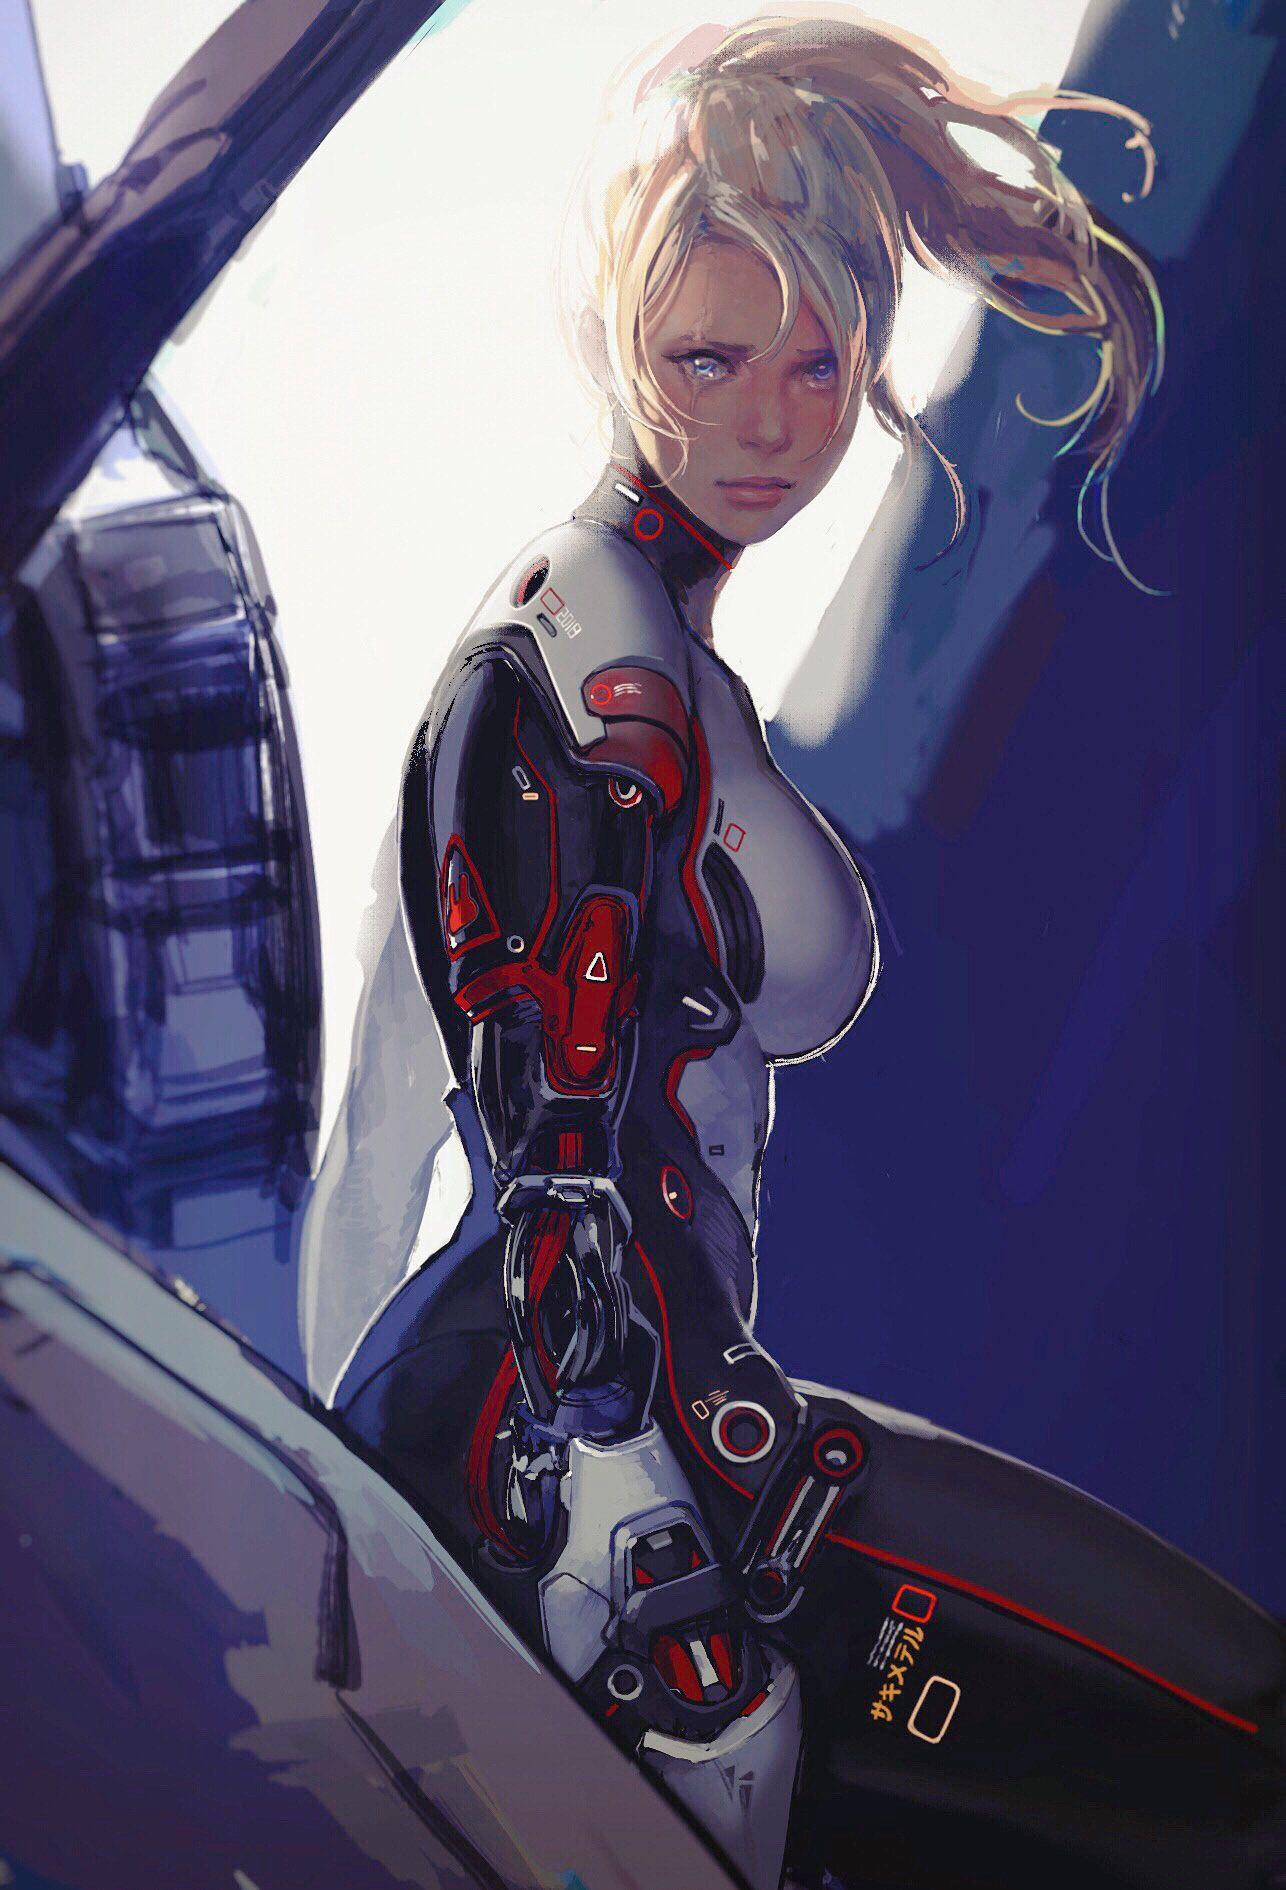 so cyberpunk girl future music